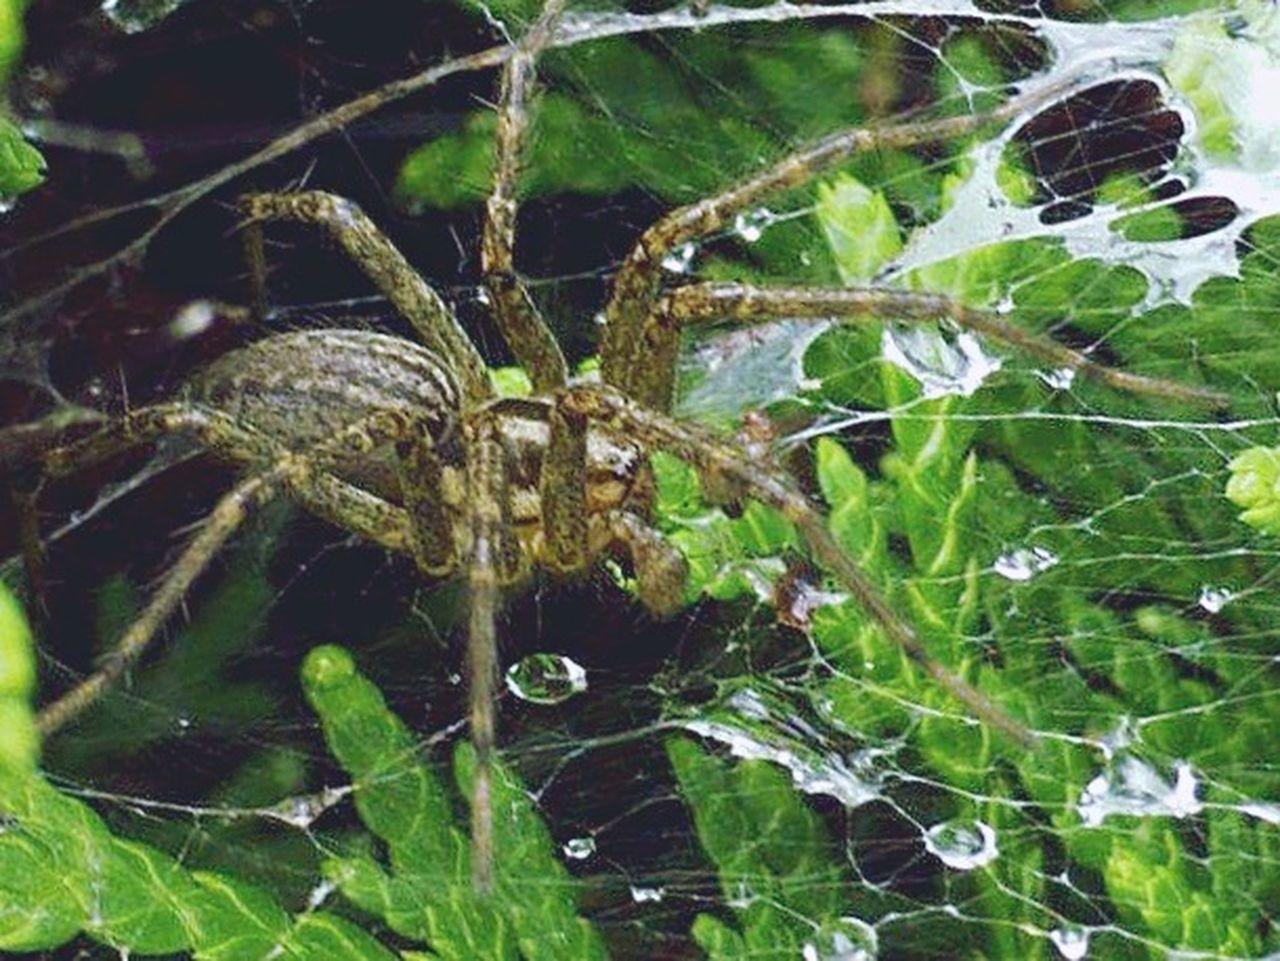 Spider Series Arachnophobia Arachnipocalypse Arachni-therapy Macro Photography Wildlife & Nature Macro Nature Funnel web Spider Arachnid